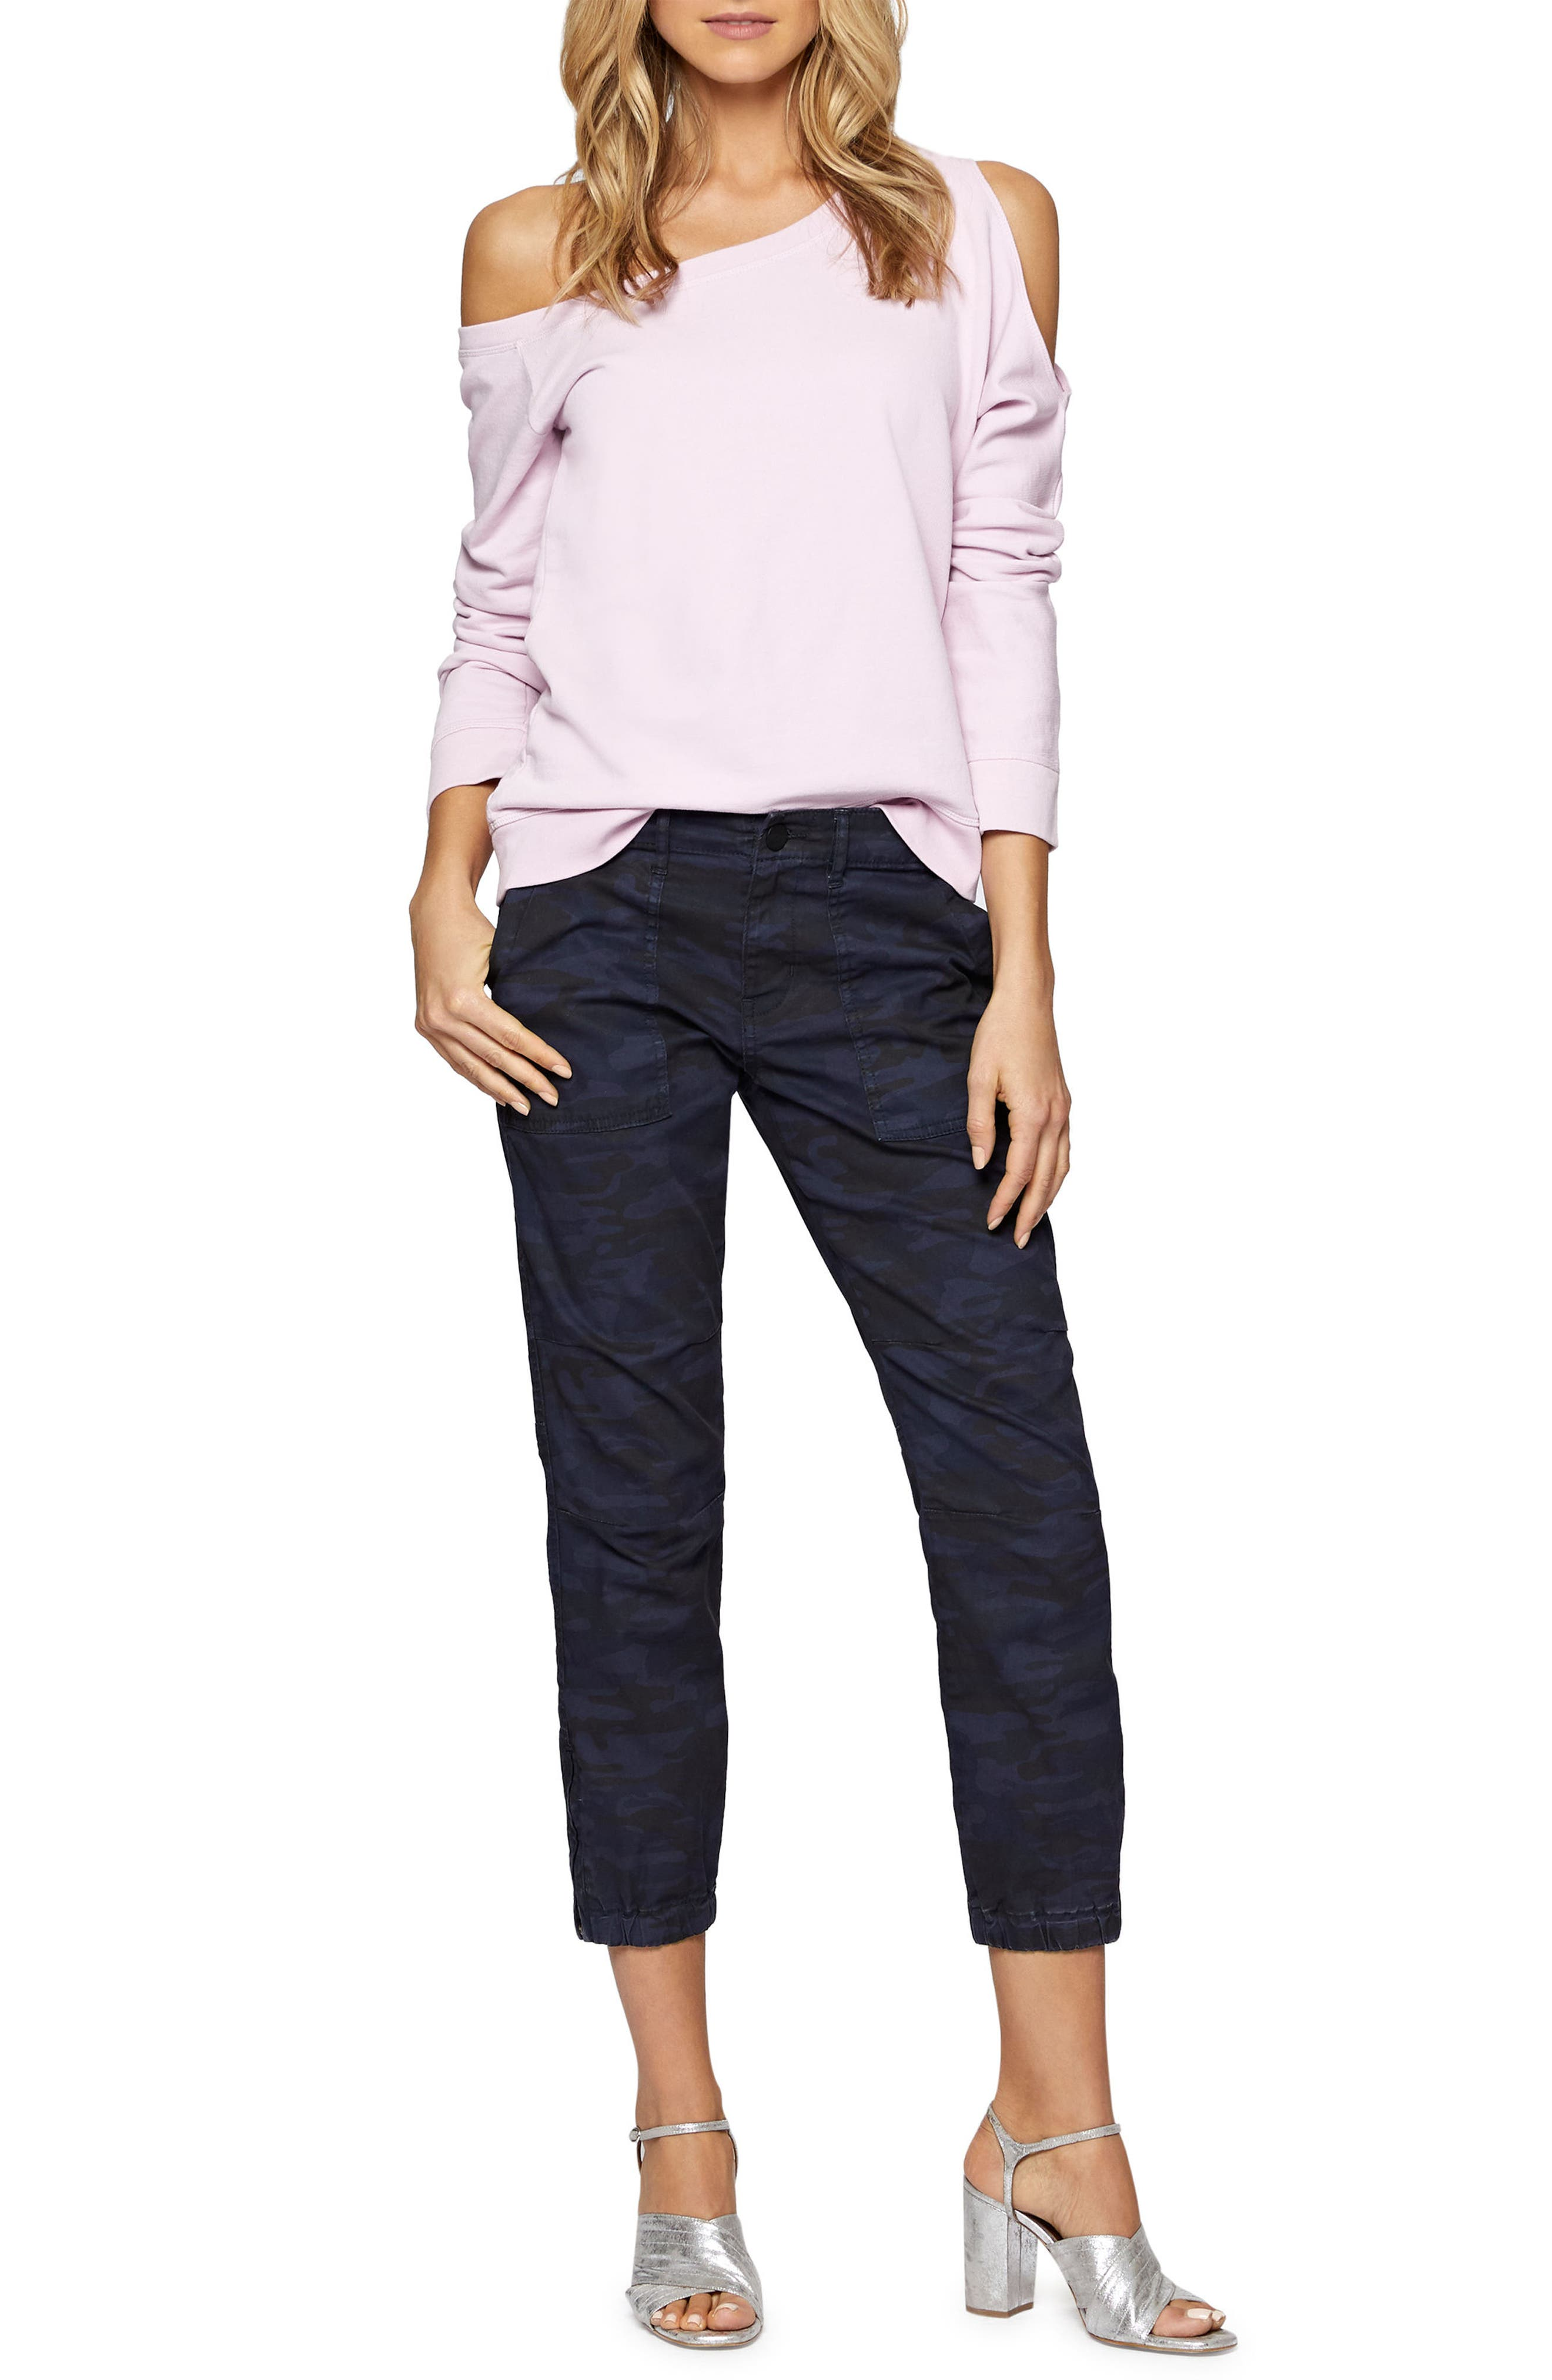 Alexi Asymmetrical Sweatshirt,                             Alternate thumbnail 9, color,